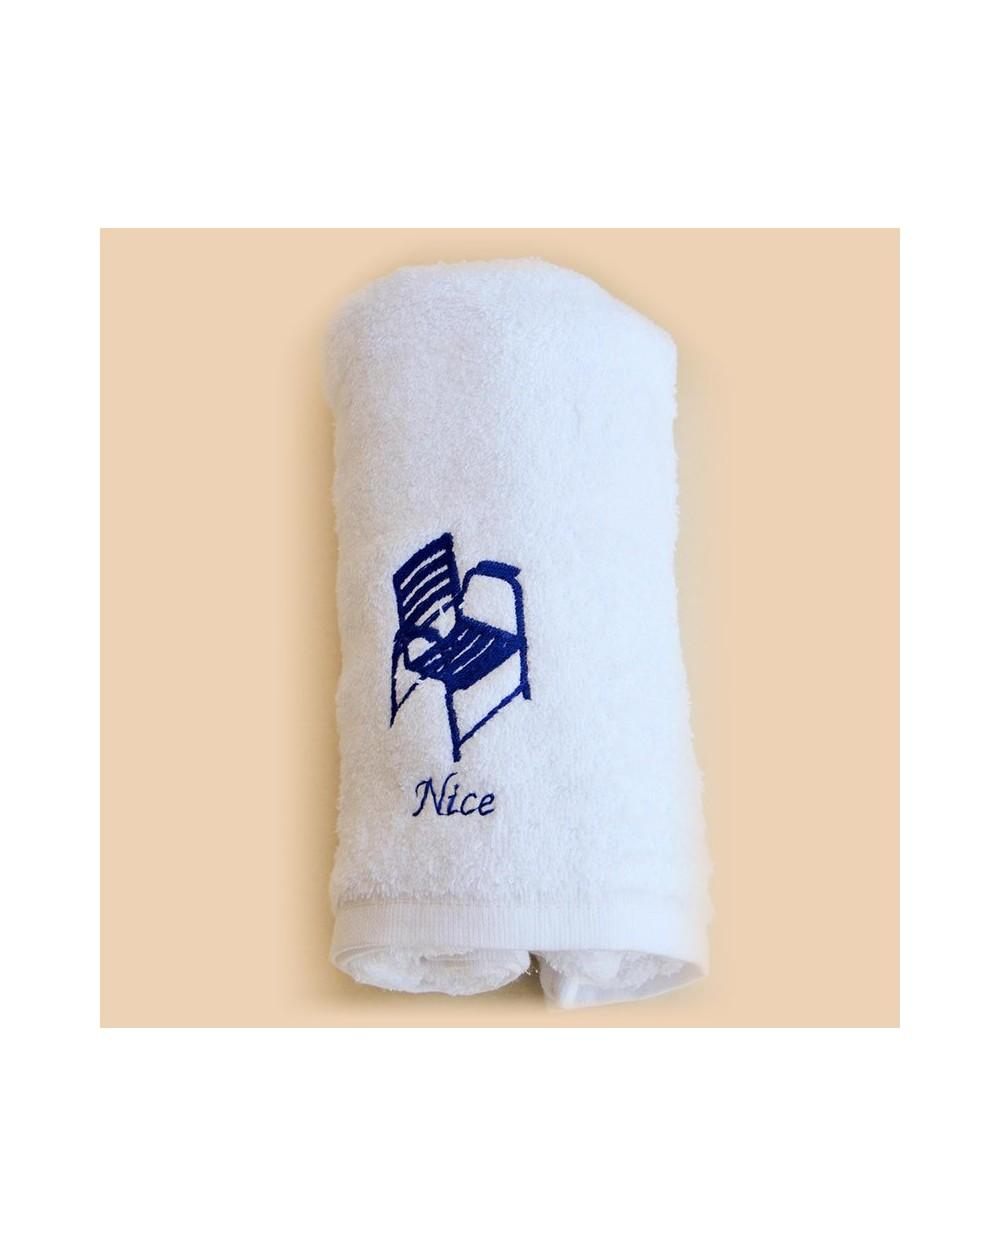 Serviette de Toilette blanche 50 x 100